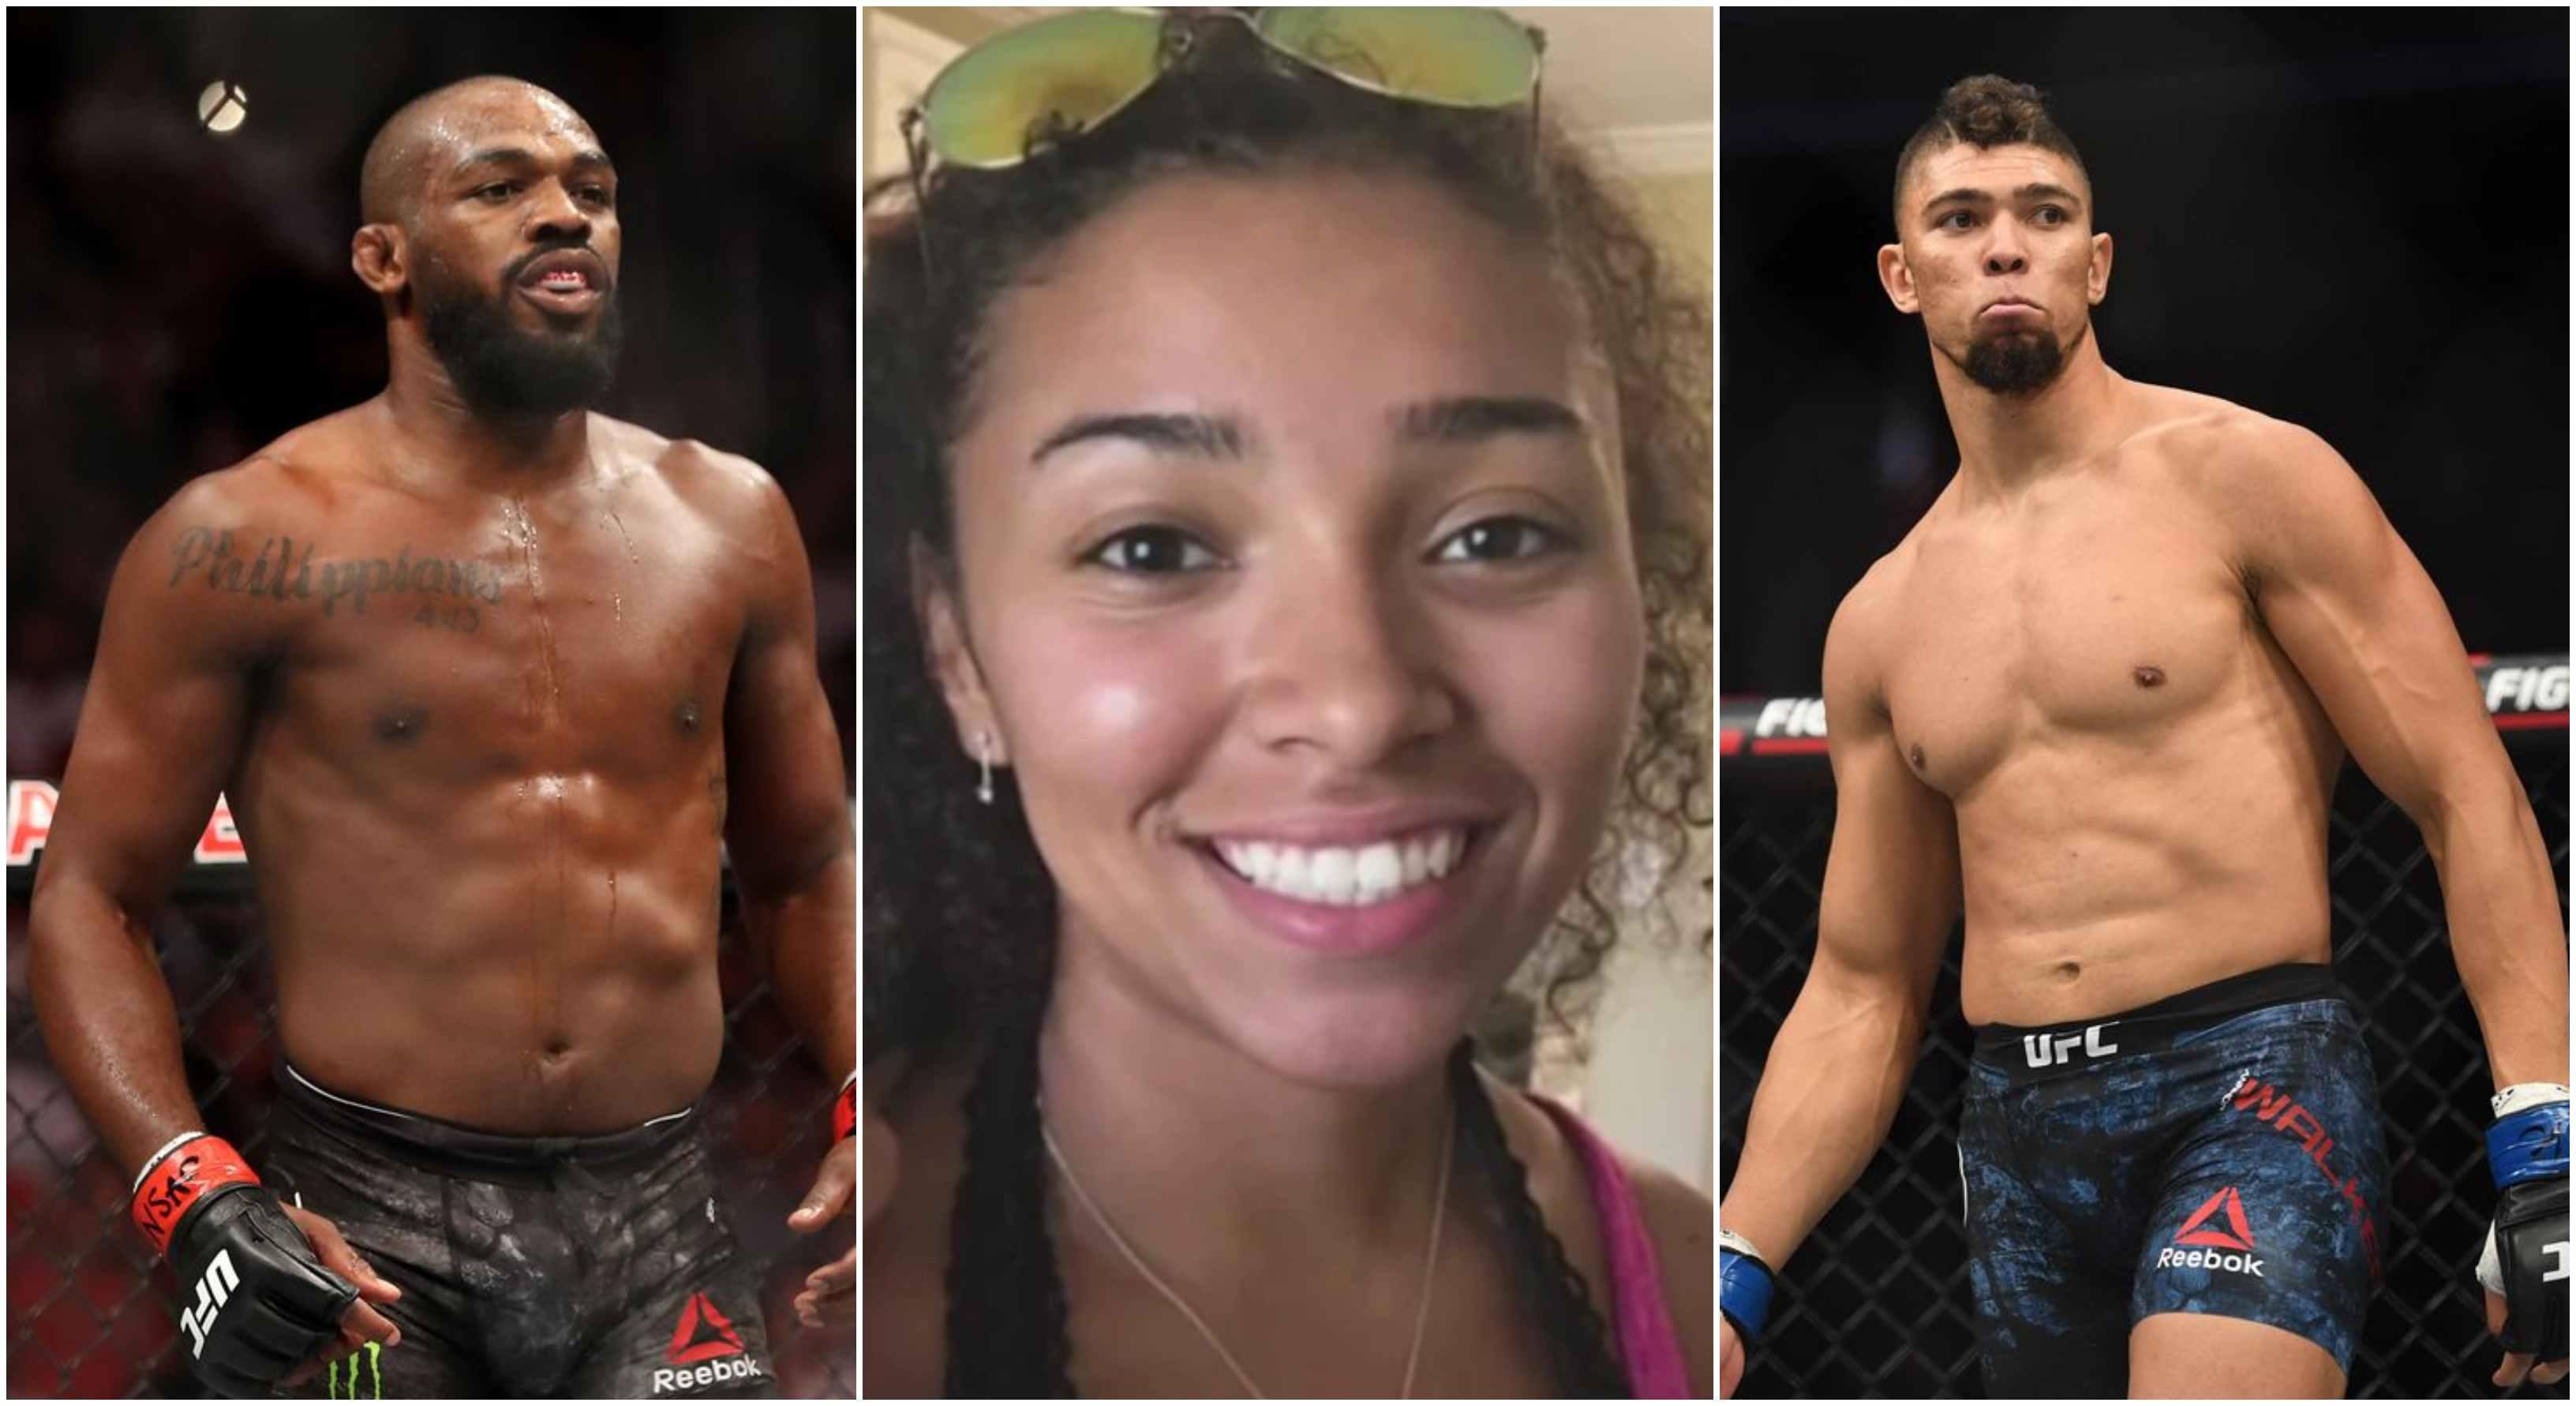 Jon Jones, Johnny Walker and Ali Abdelaziz each offer $25,000 reward for information on Walt Harris' daughter - Walt